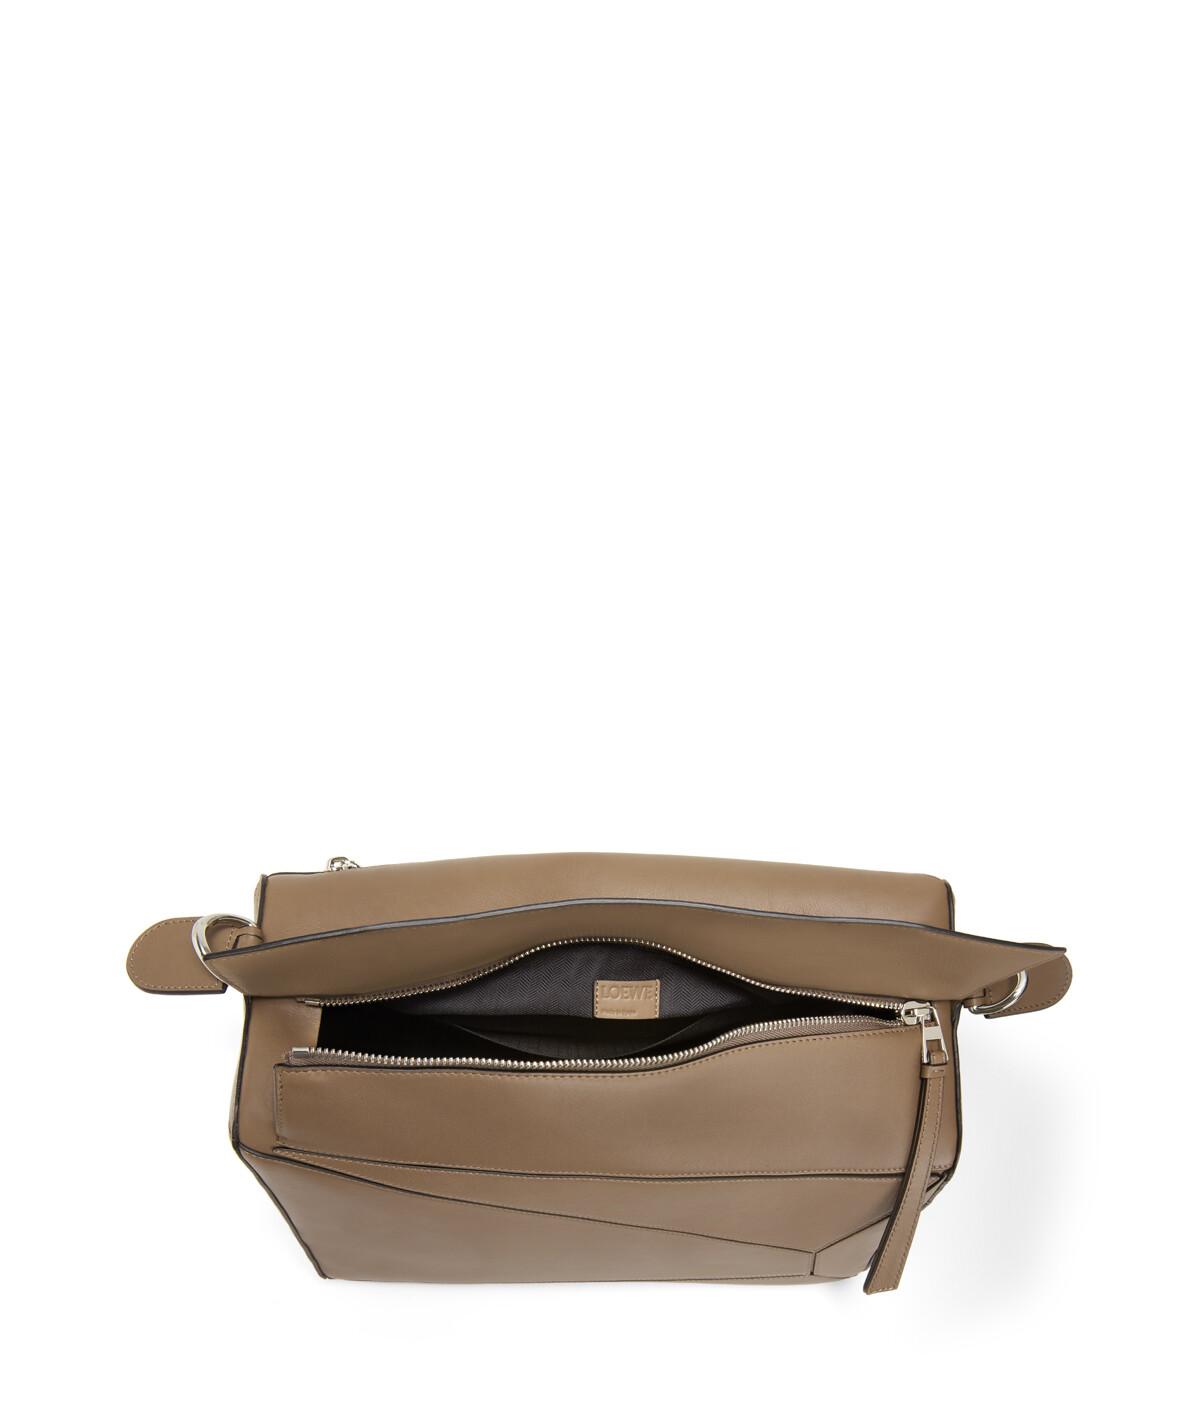 LOEWE Puzzle Xl Bag Dark Taupe front